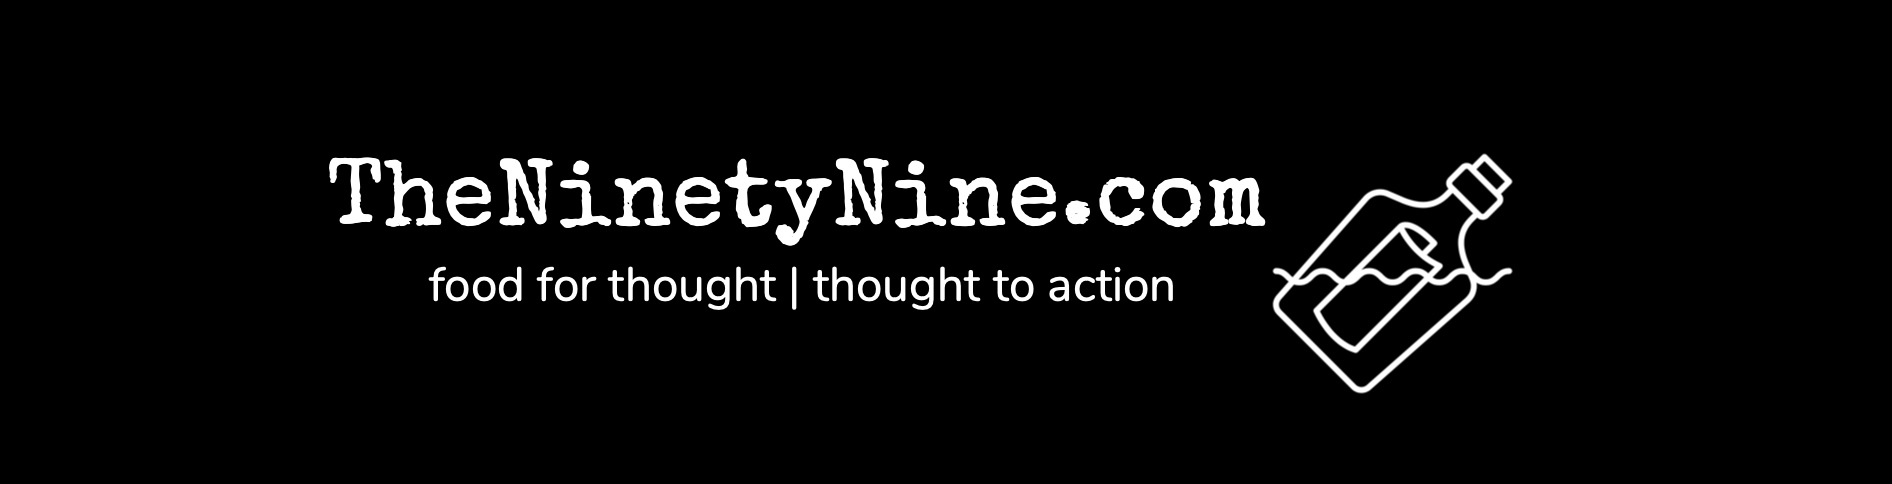 TheNinetyNine.com